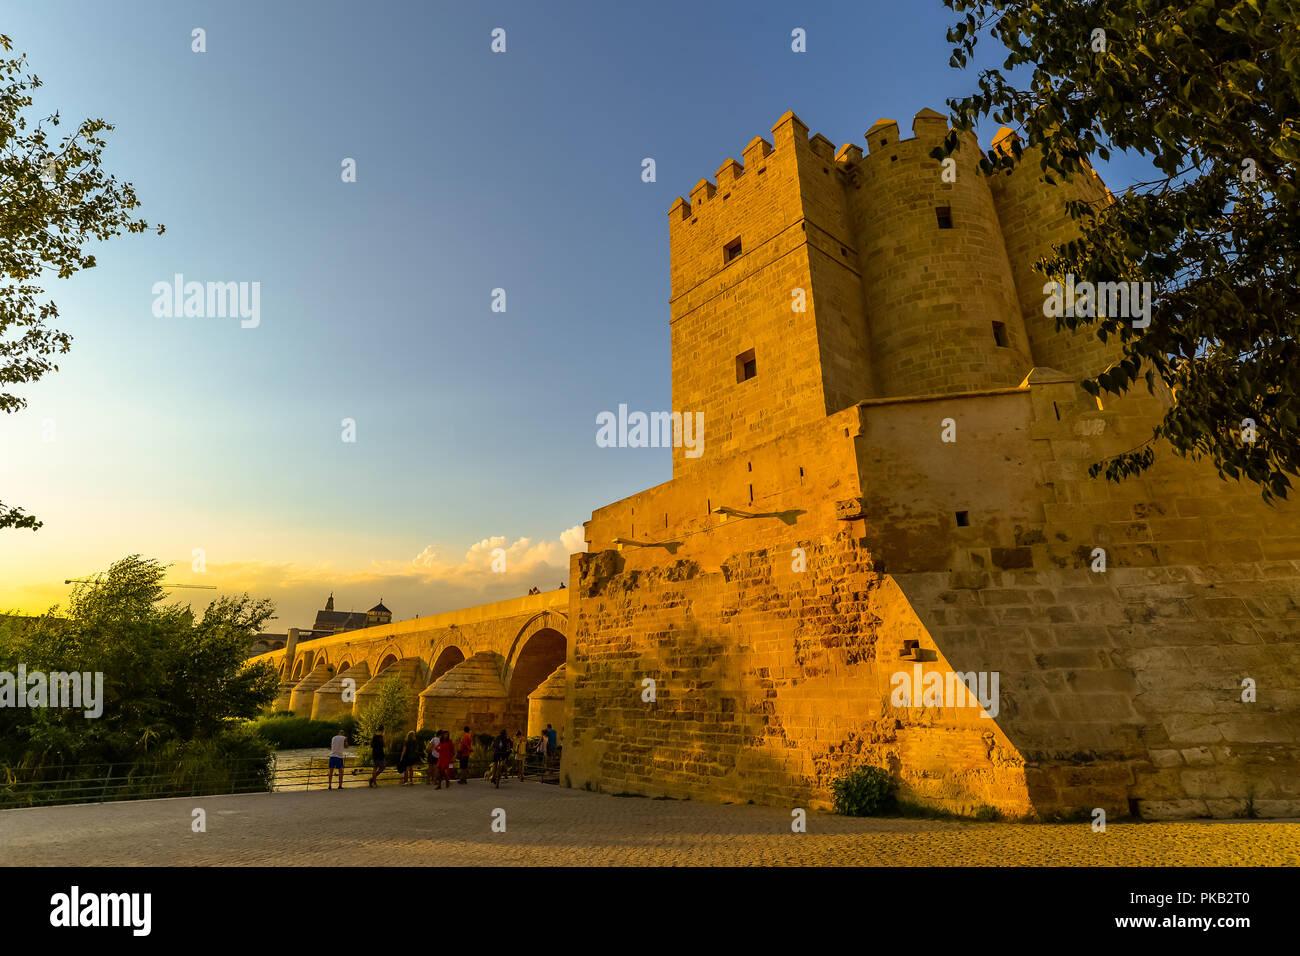 The Roman bridge in Cordoba - Spain Stock Photo